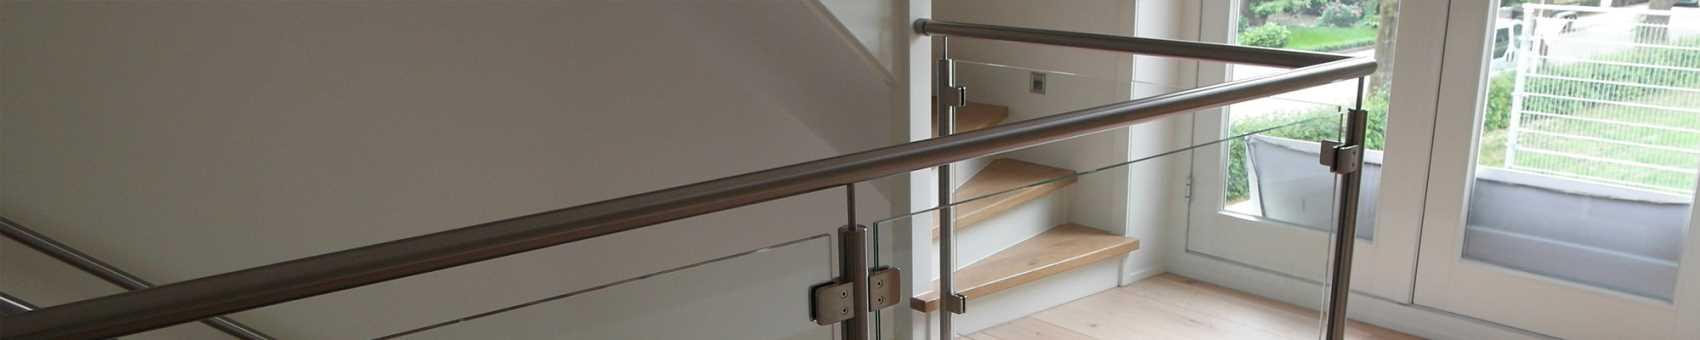 Glazen balustrade: ruimtelijk en minimalistisch!   lumigrip